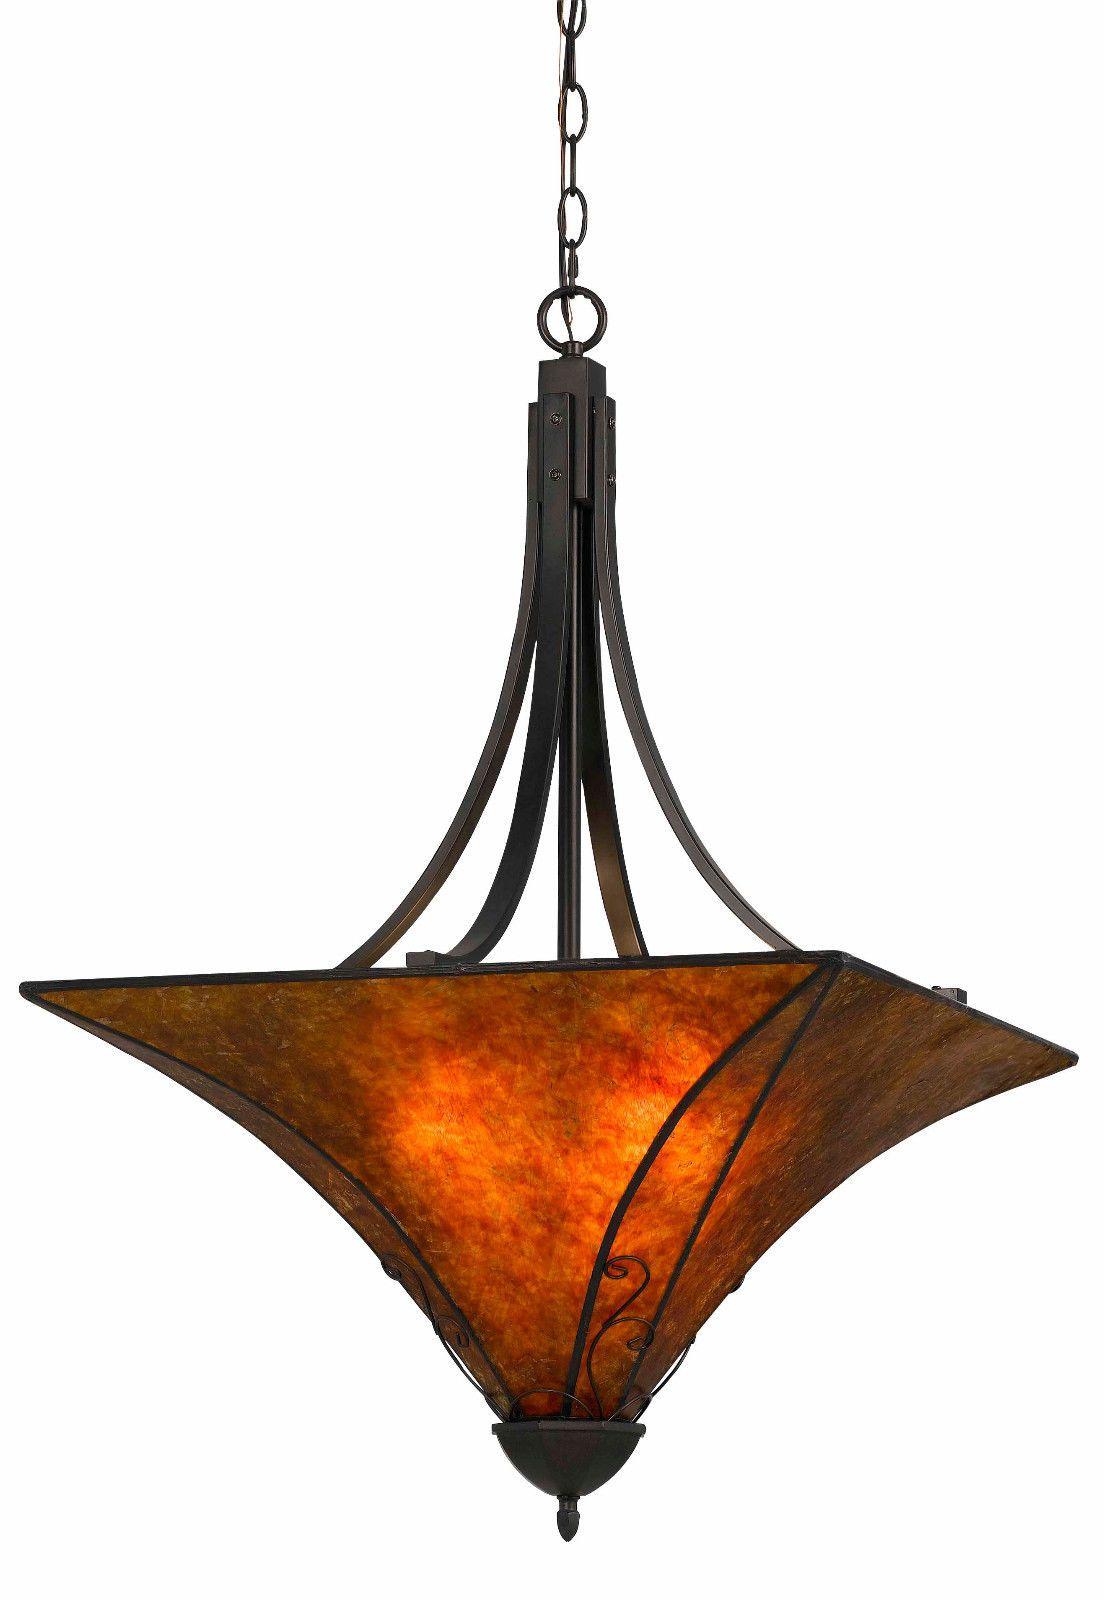 Mica Pendant Light Chandelier Art Deco Arts Crafts Design Bronze Iron Bell Curved Metal Fixture 22  Wide  sc 1 st  Pinterest & Mica Pendant Light Chandelier Art Deco Arts Crafts Design Bronze ...